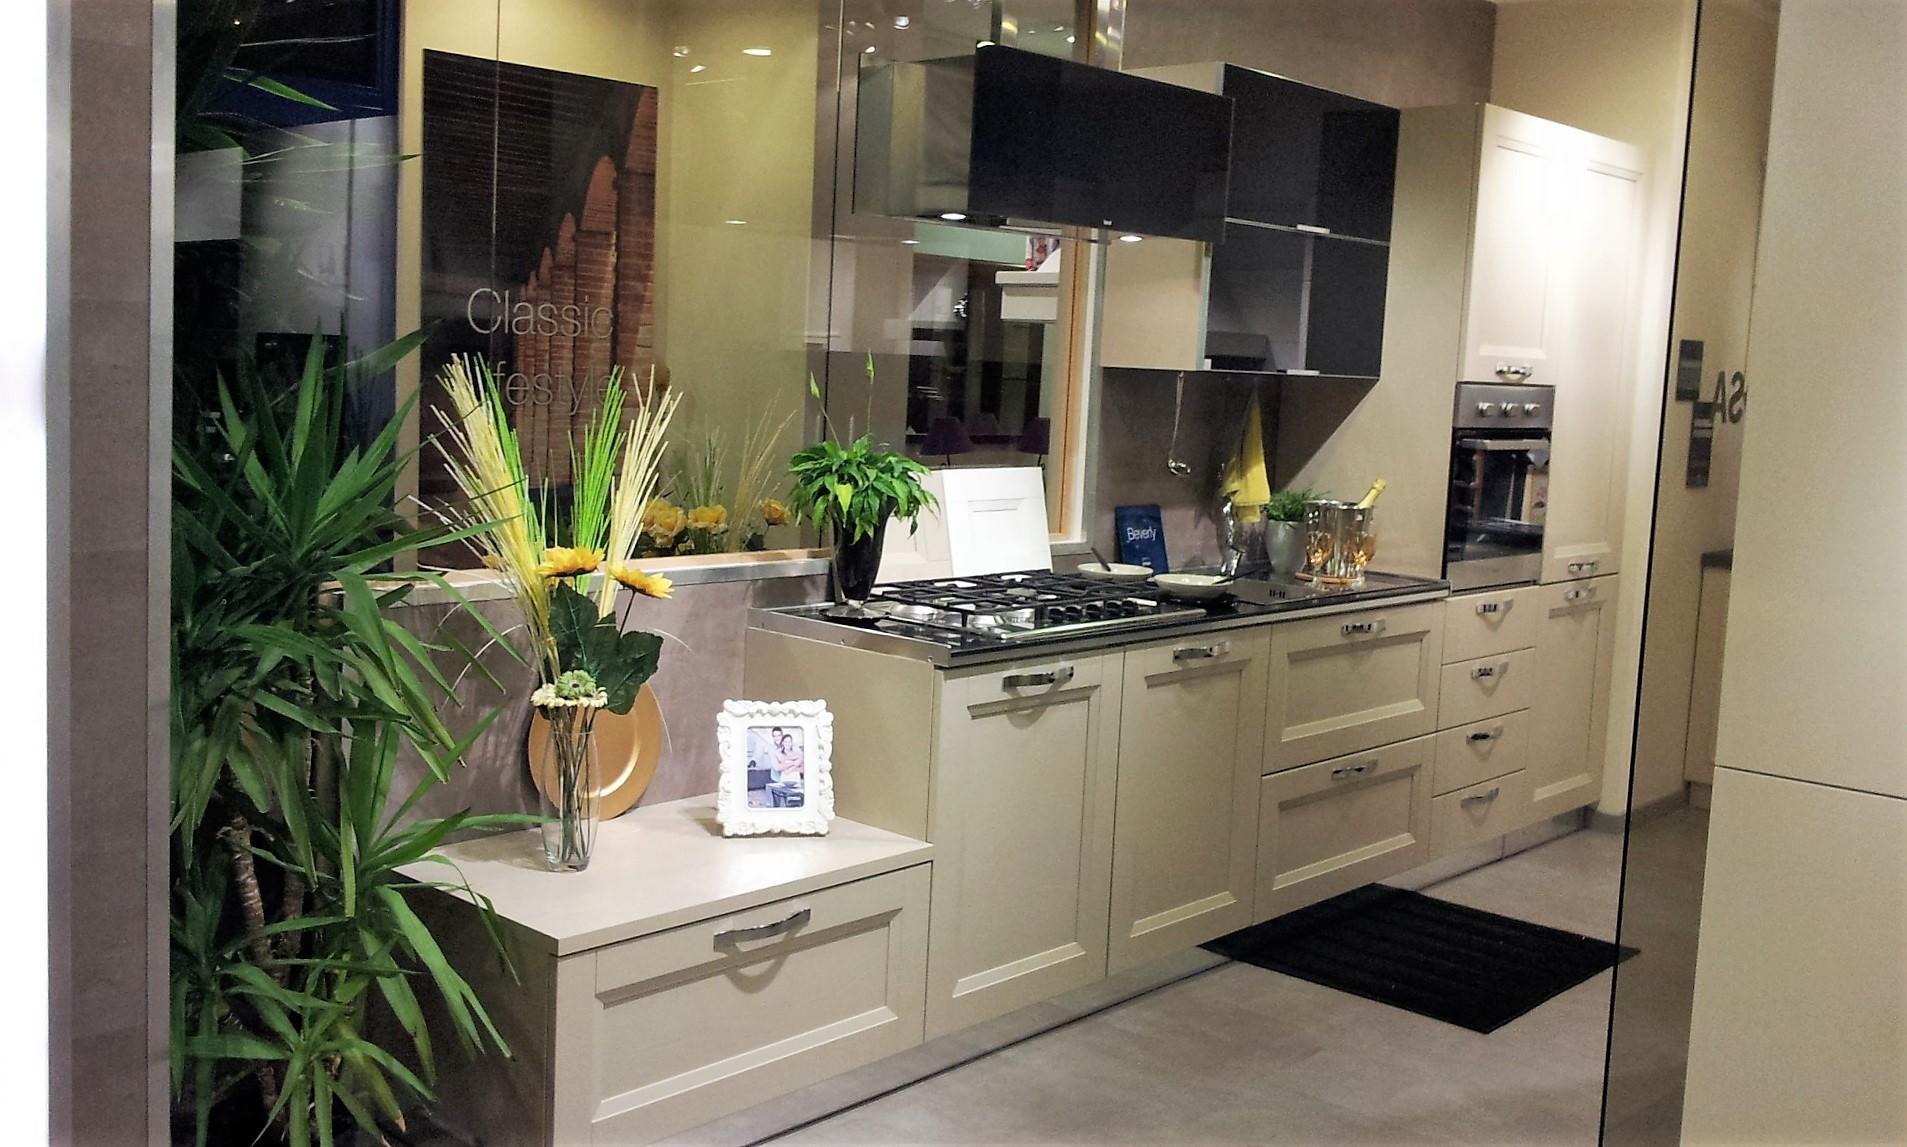 Gallery of stunning cucina da colorare ideas us with - Colorare ante cucina ...